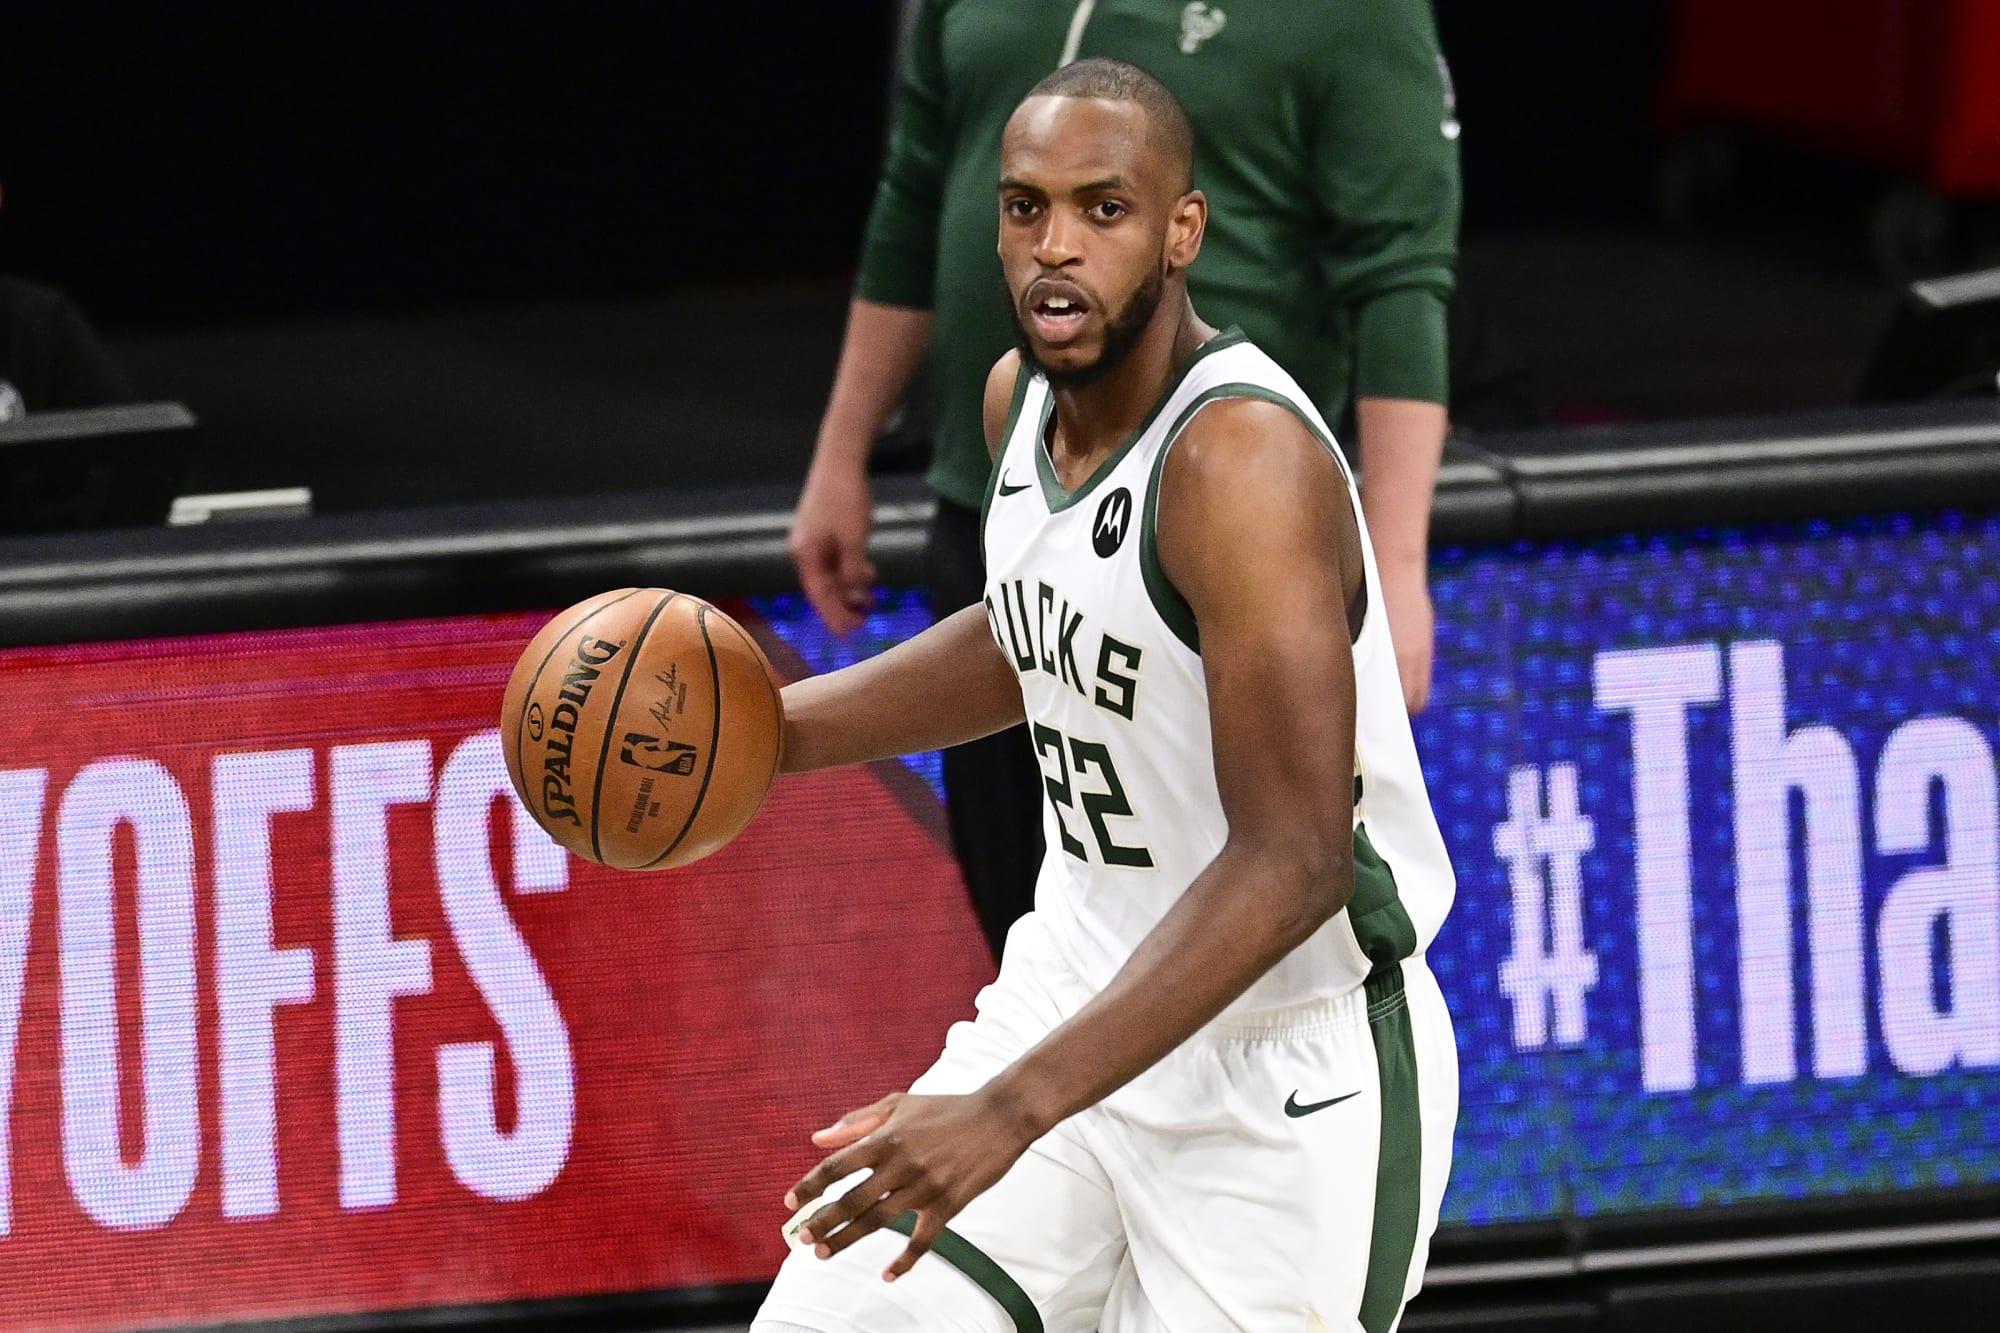 Milwaukee Bucks force game 7, Middleton has career game